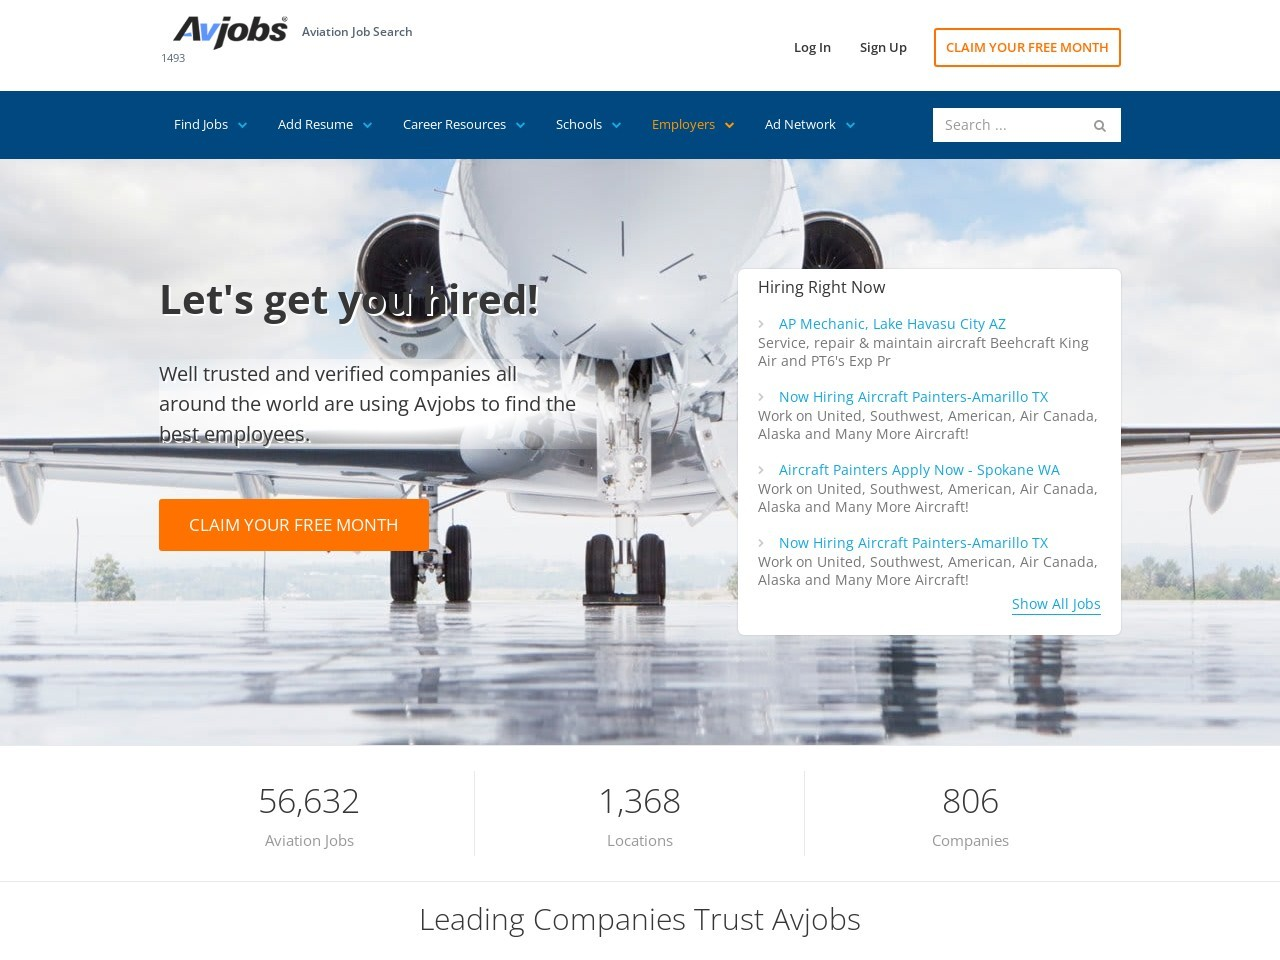 Management Job At Premier Solutions Group Llc - Airport Director